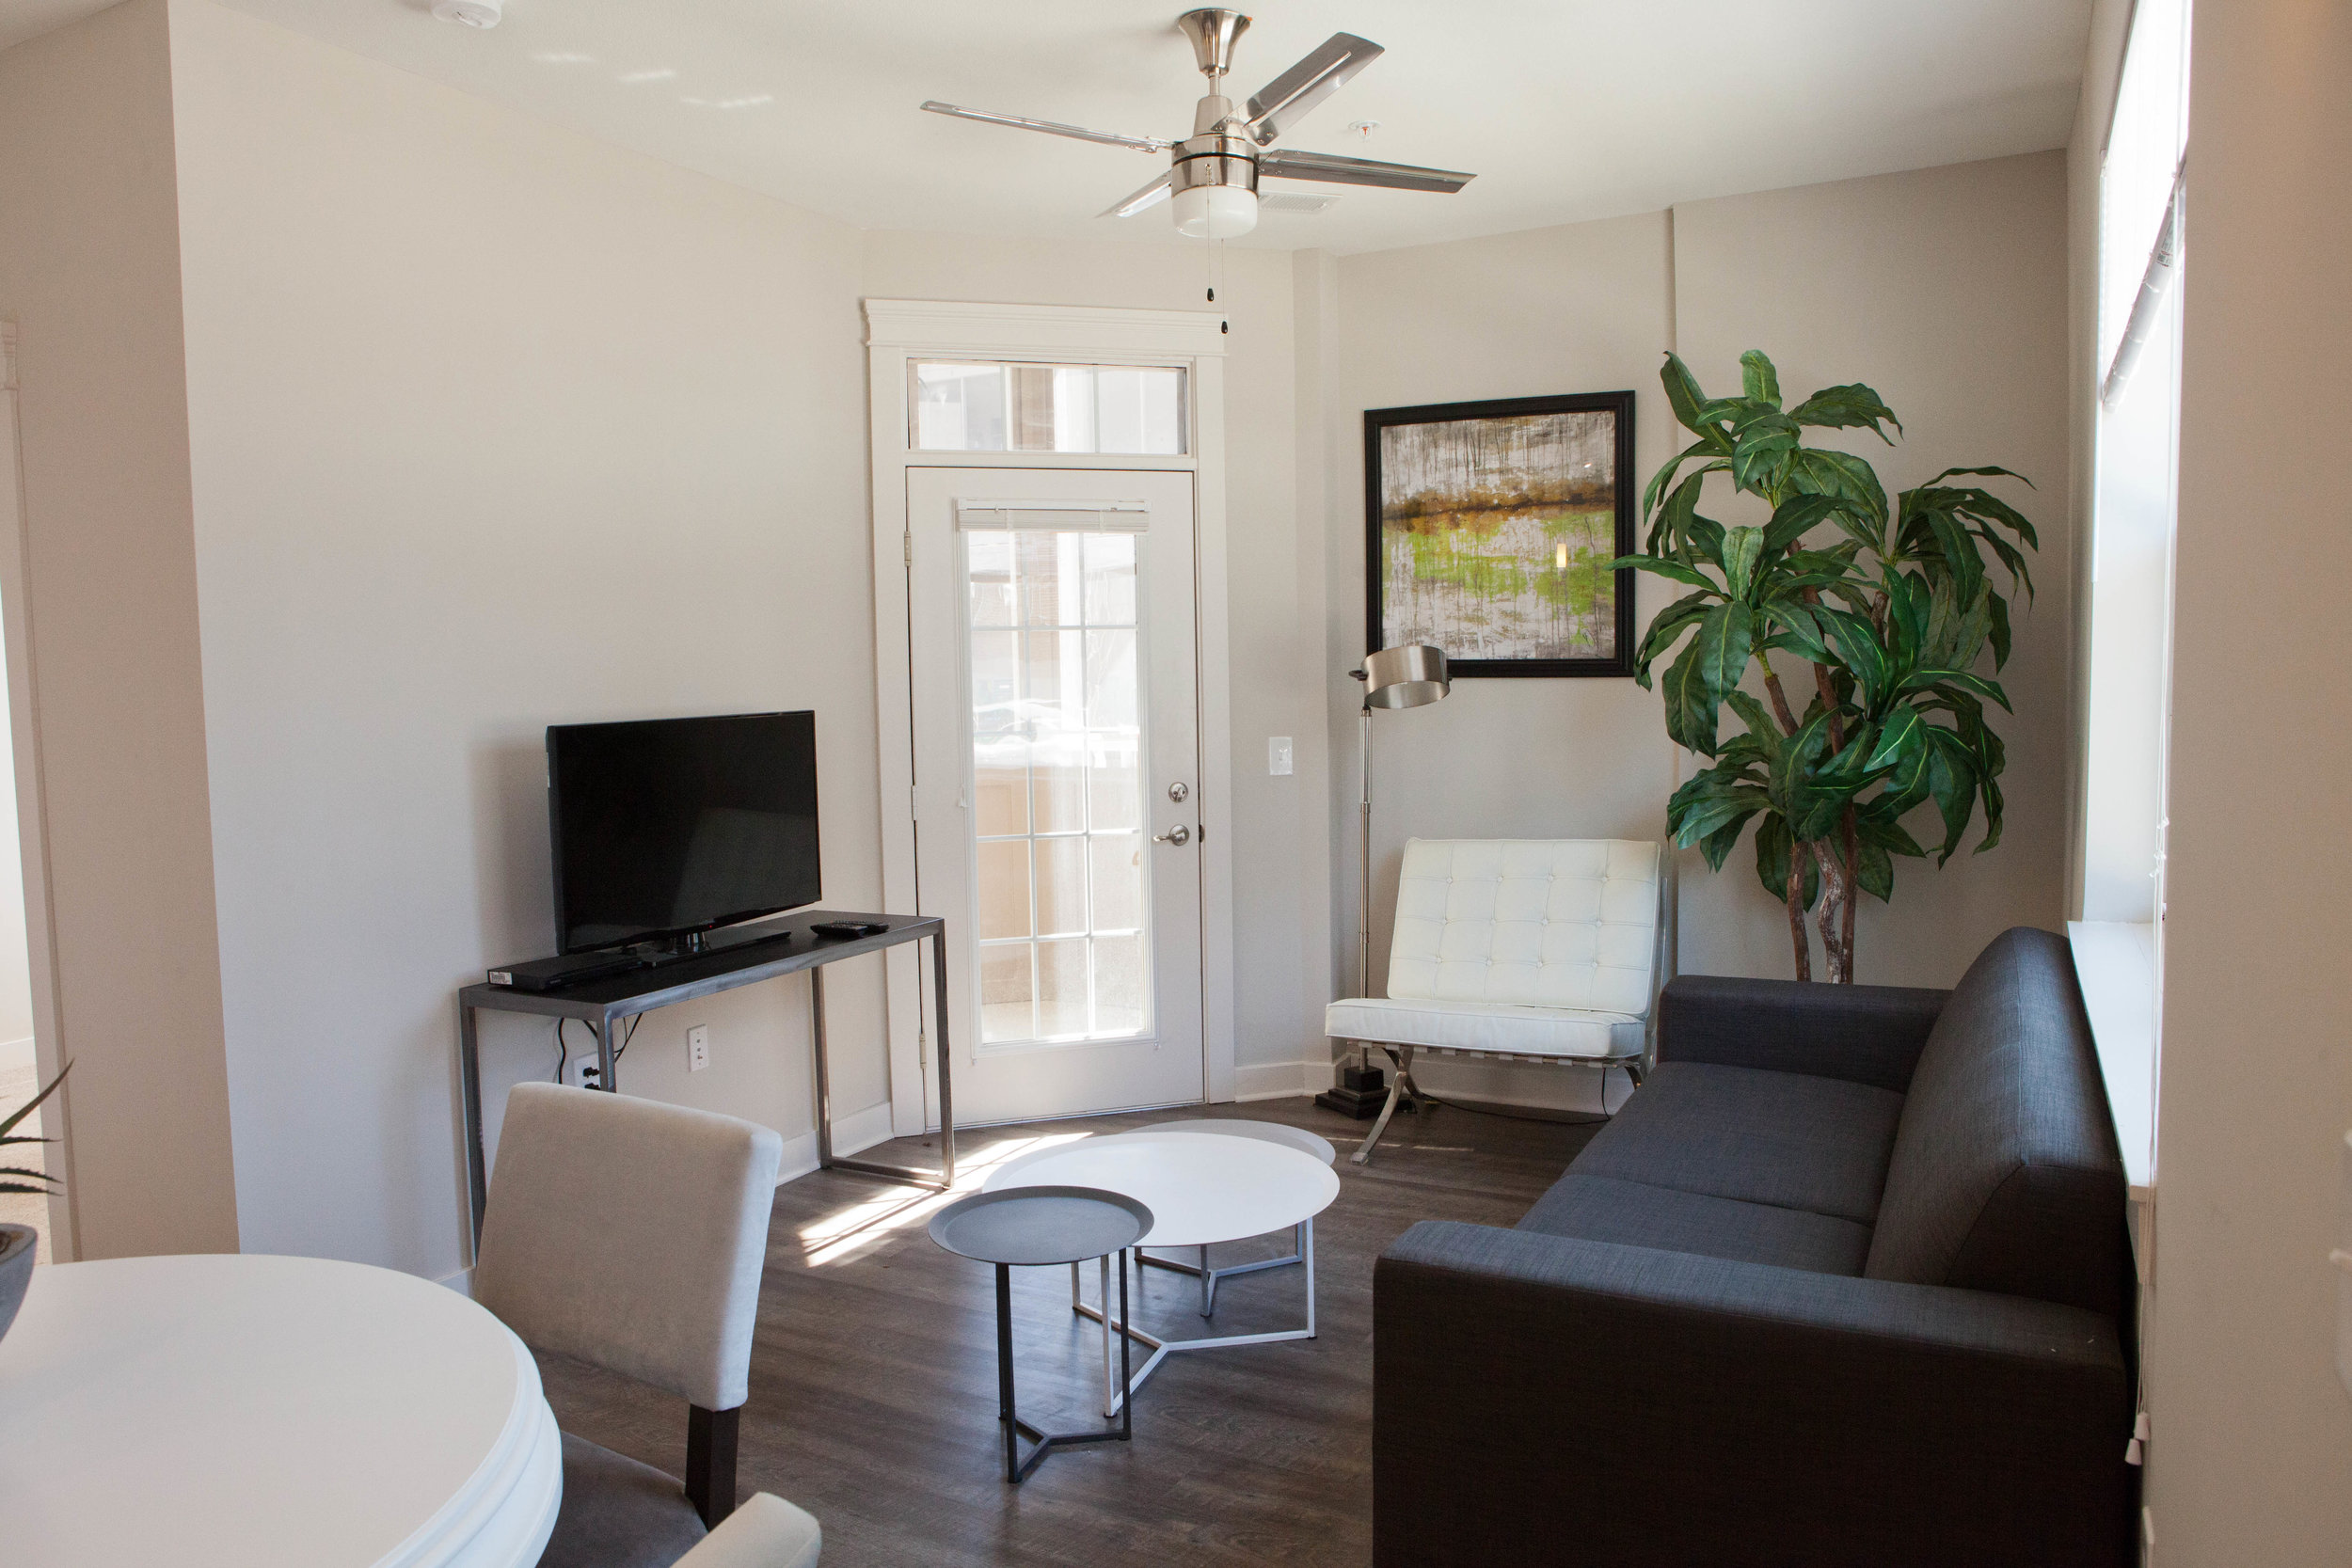 City Flats on Walnut - model living room (apartment).JPG